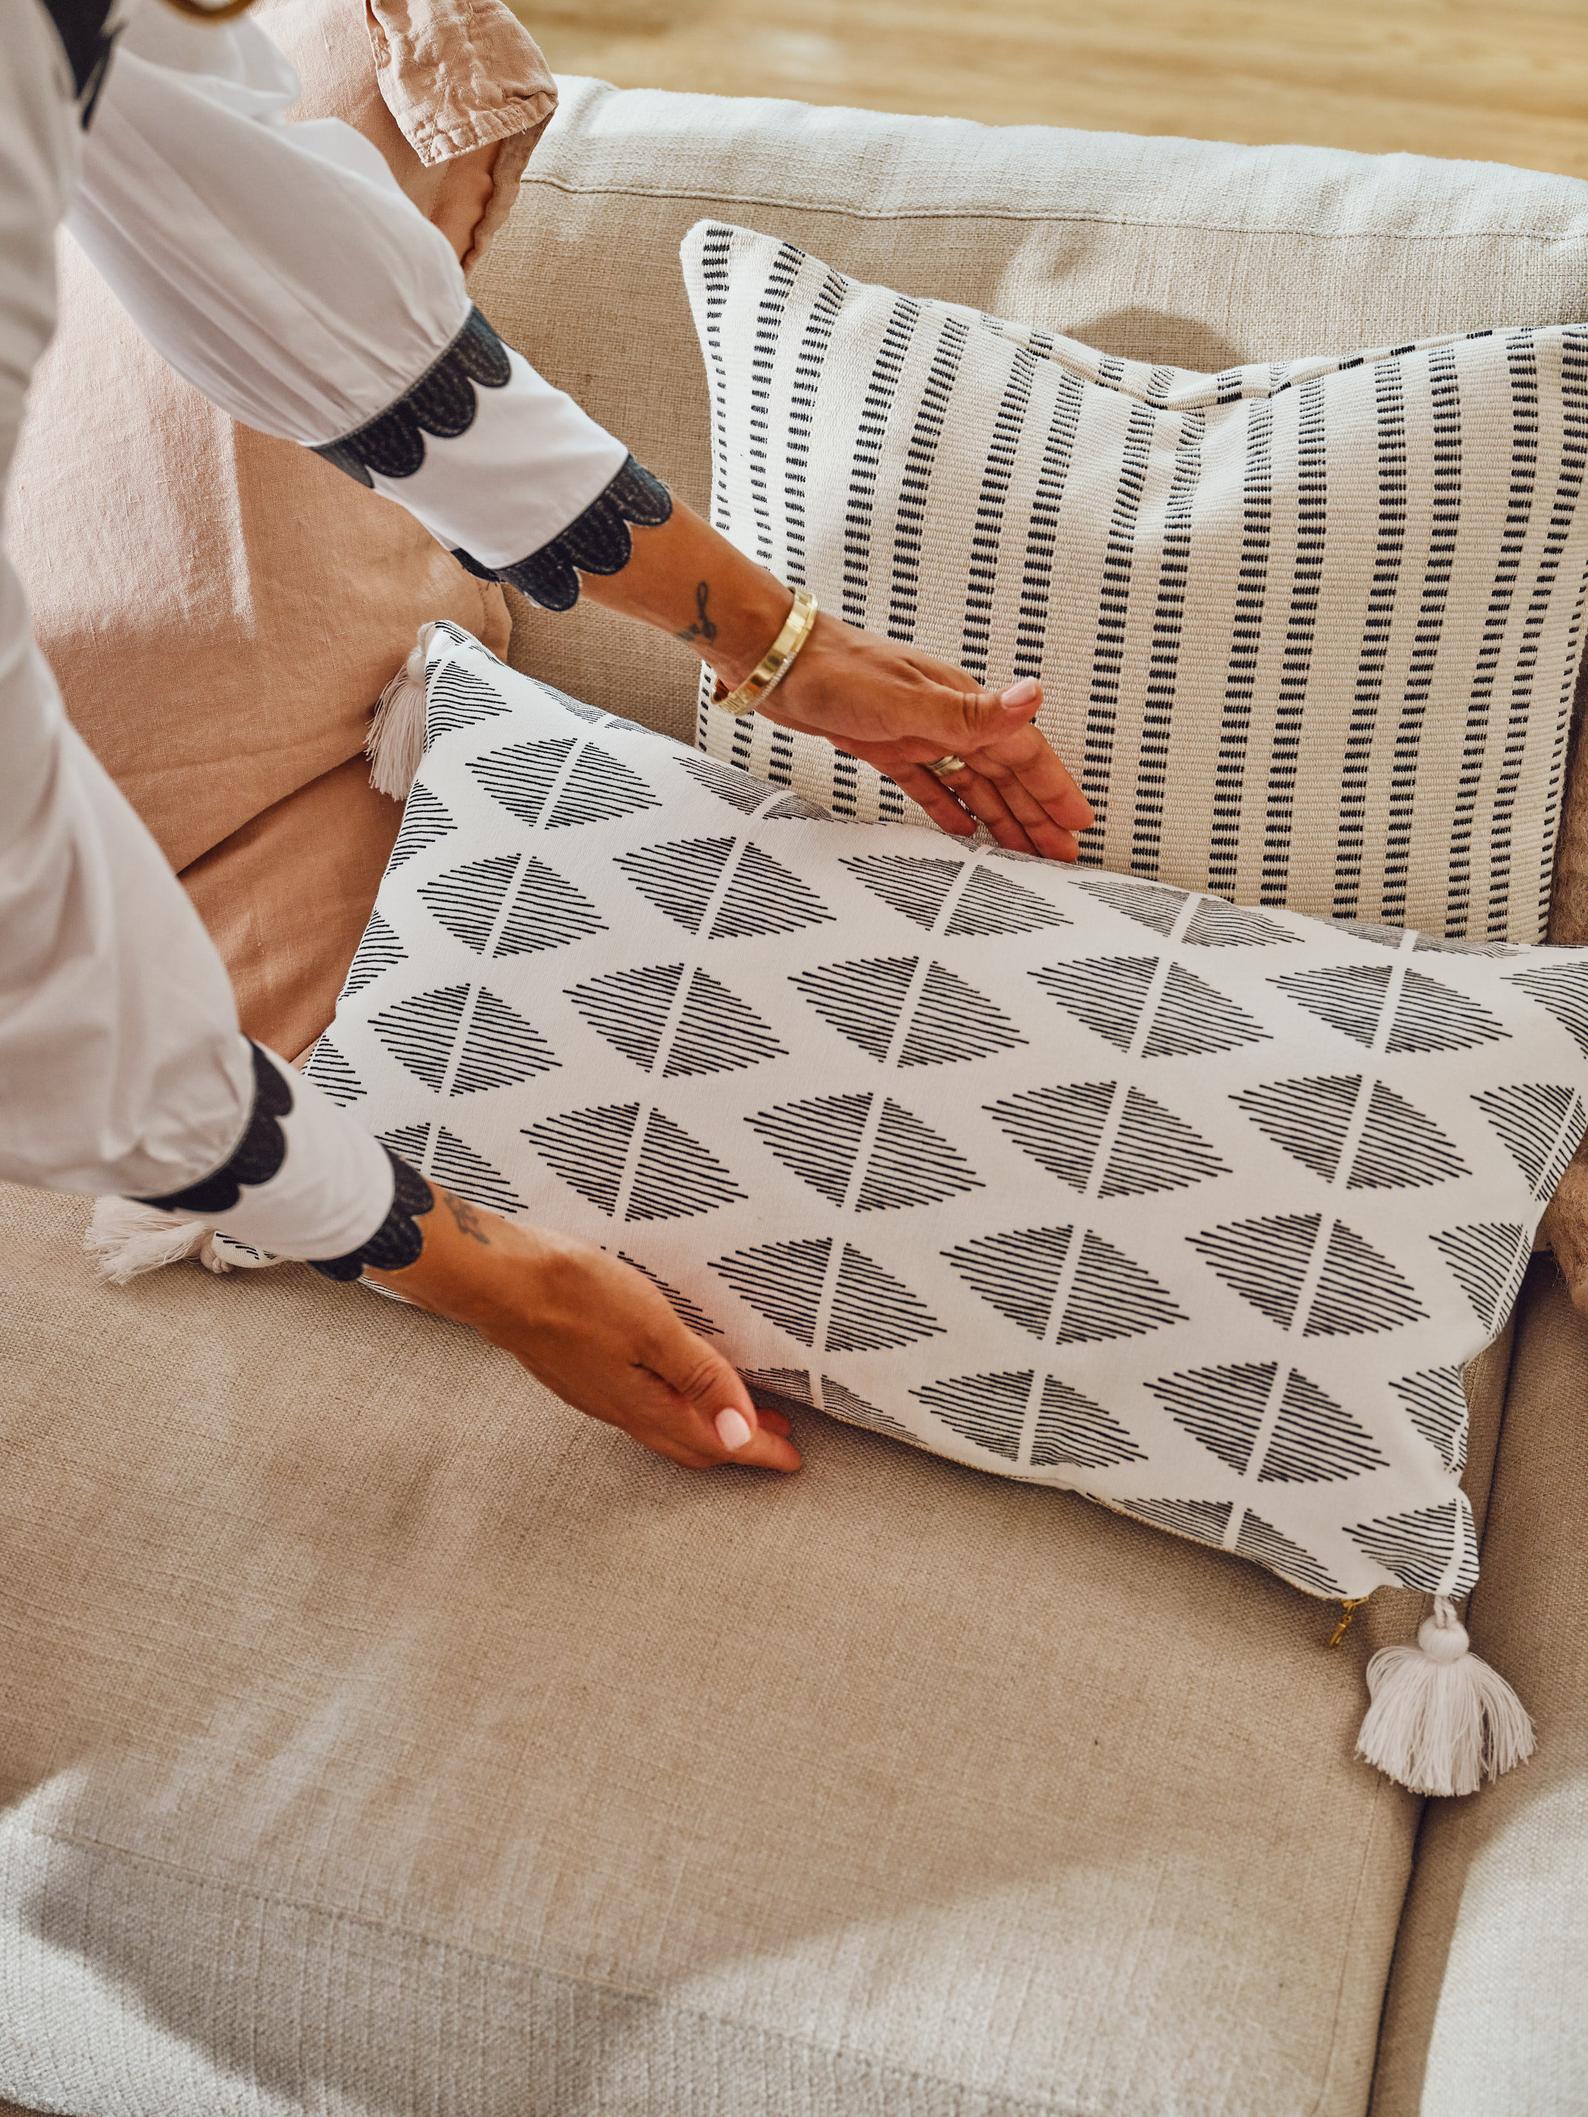 Tia Mowry x Etsy, Geo Tassel Lumbar Throw Pillow Cover with Brass Zipper